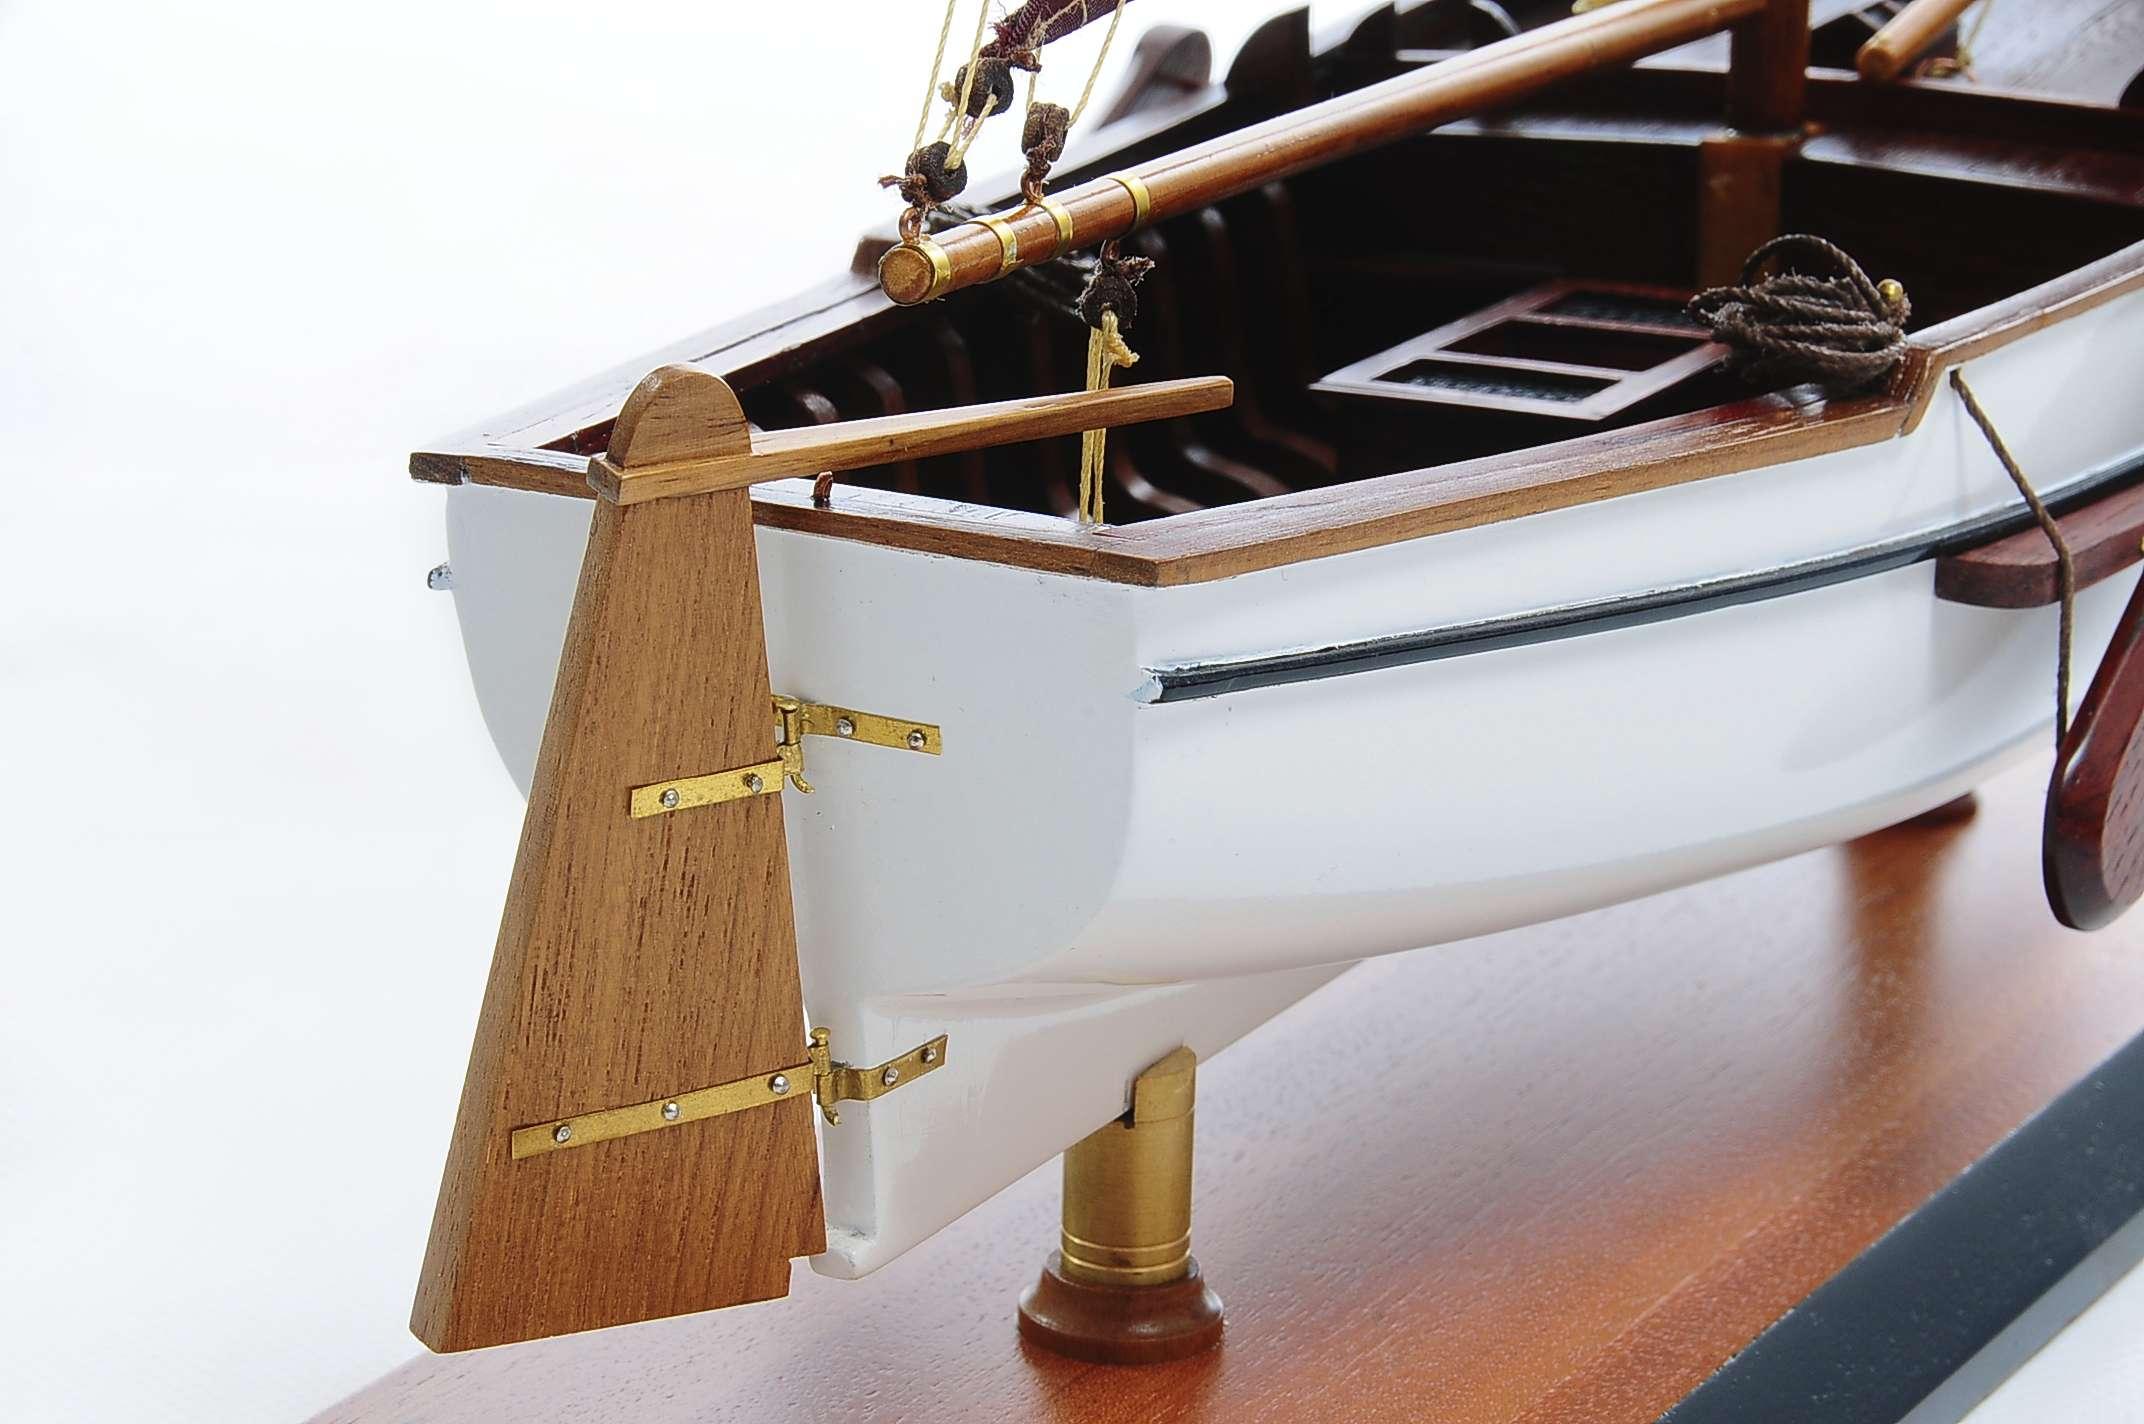 1432-4580-Dutch-Marker-Roundbow-Model-Boat